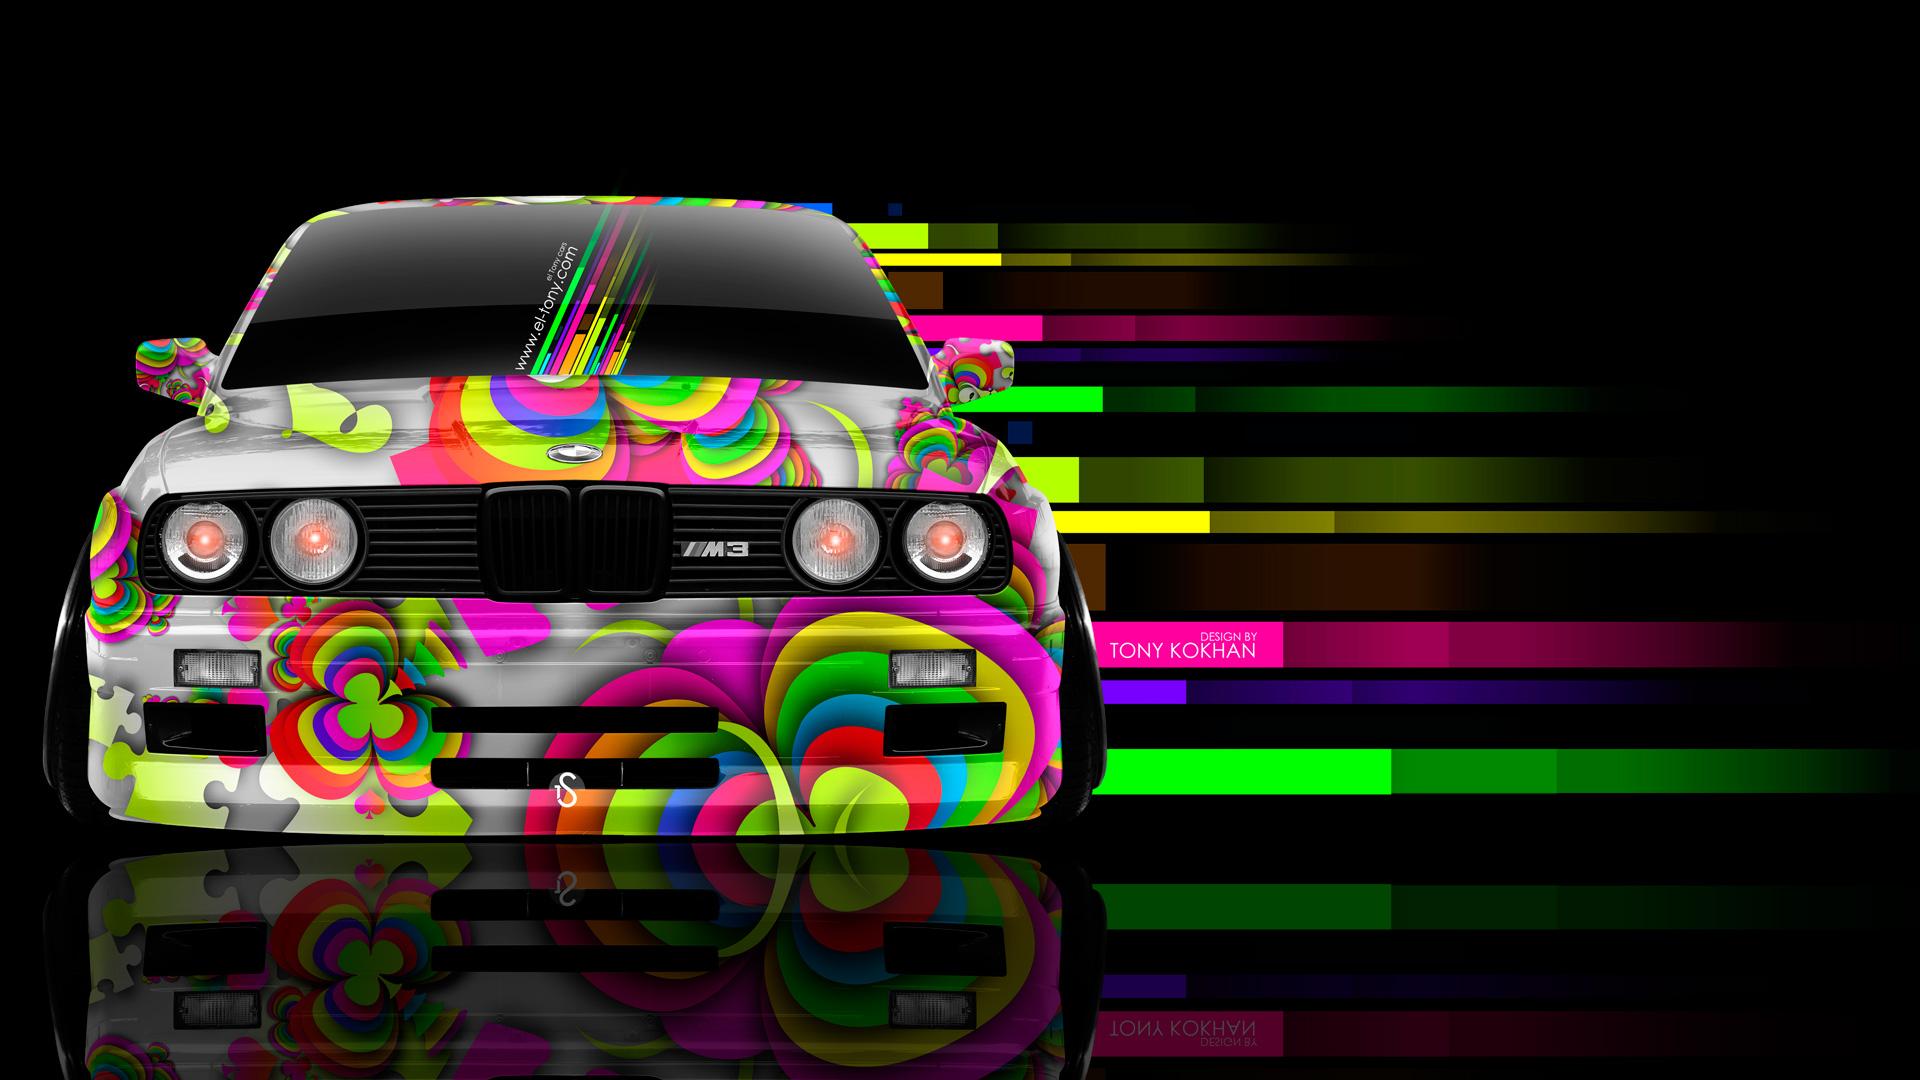 Fire-Car-Abstract-p-Free-HD-Resolutions-Car-wallpaper-wp3605571